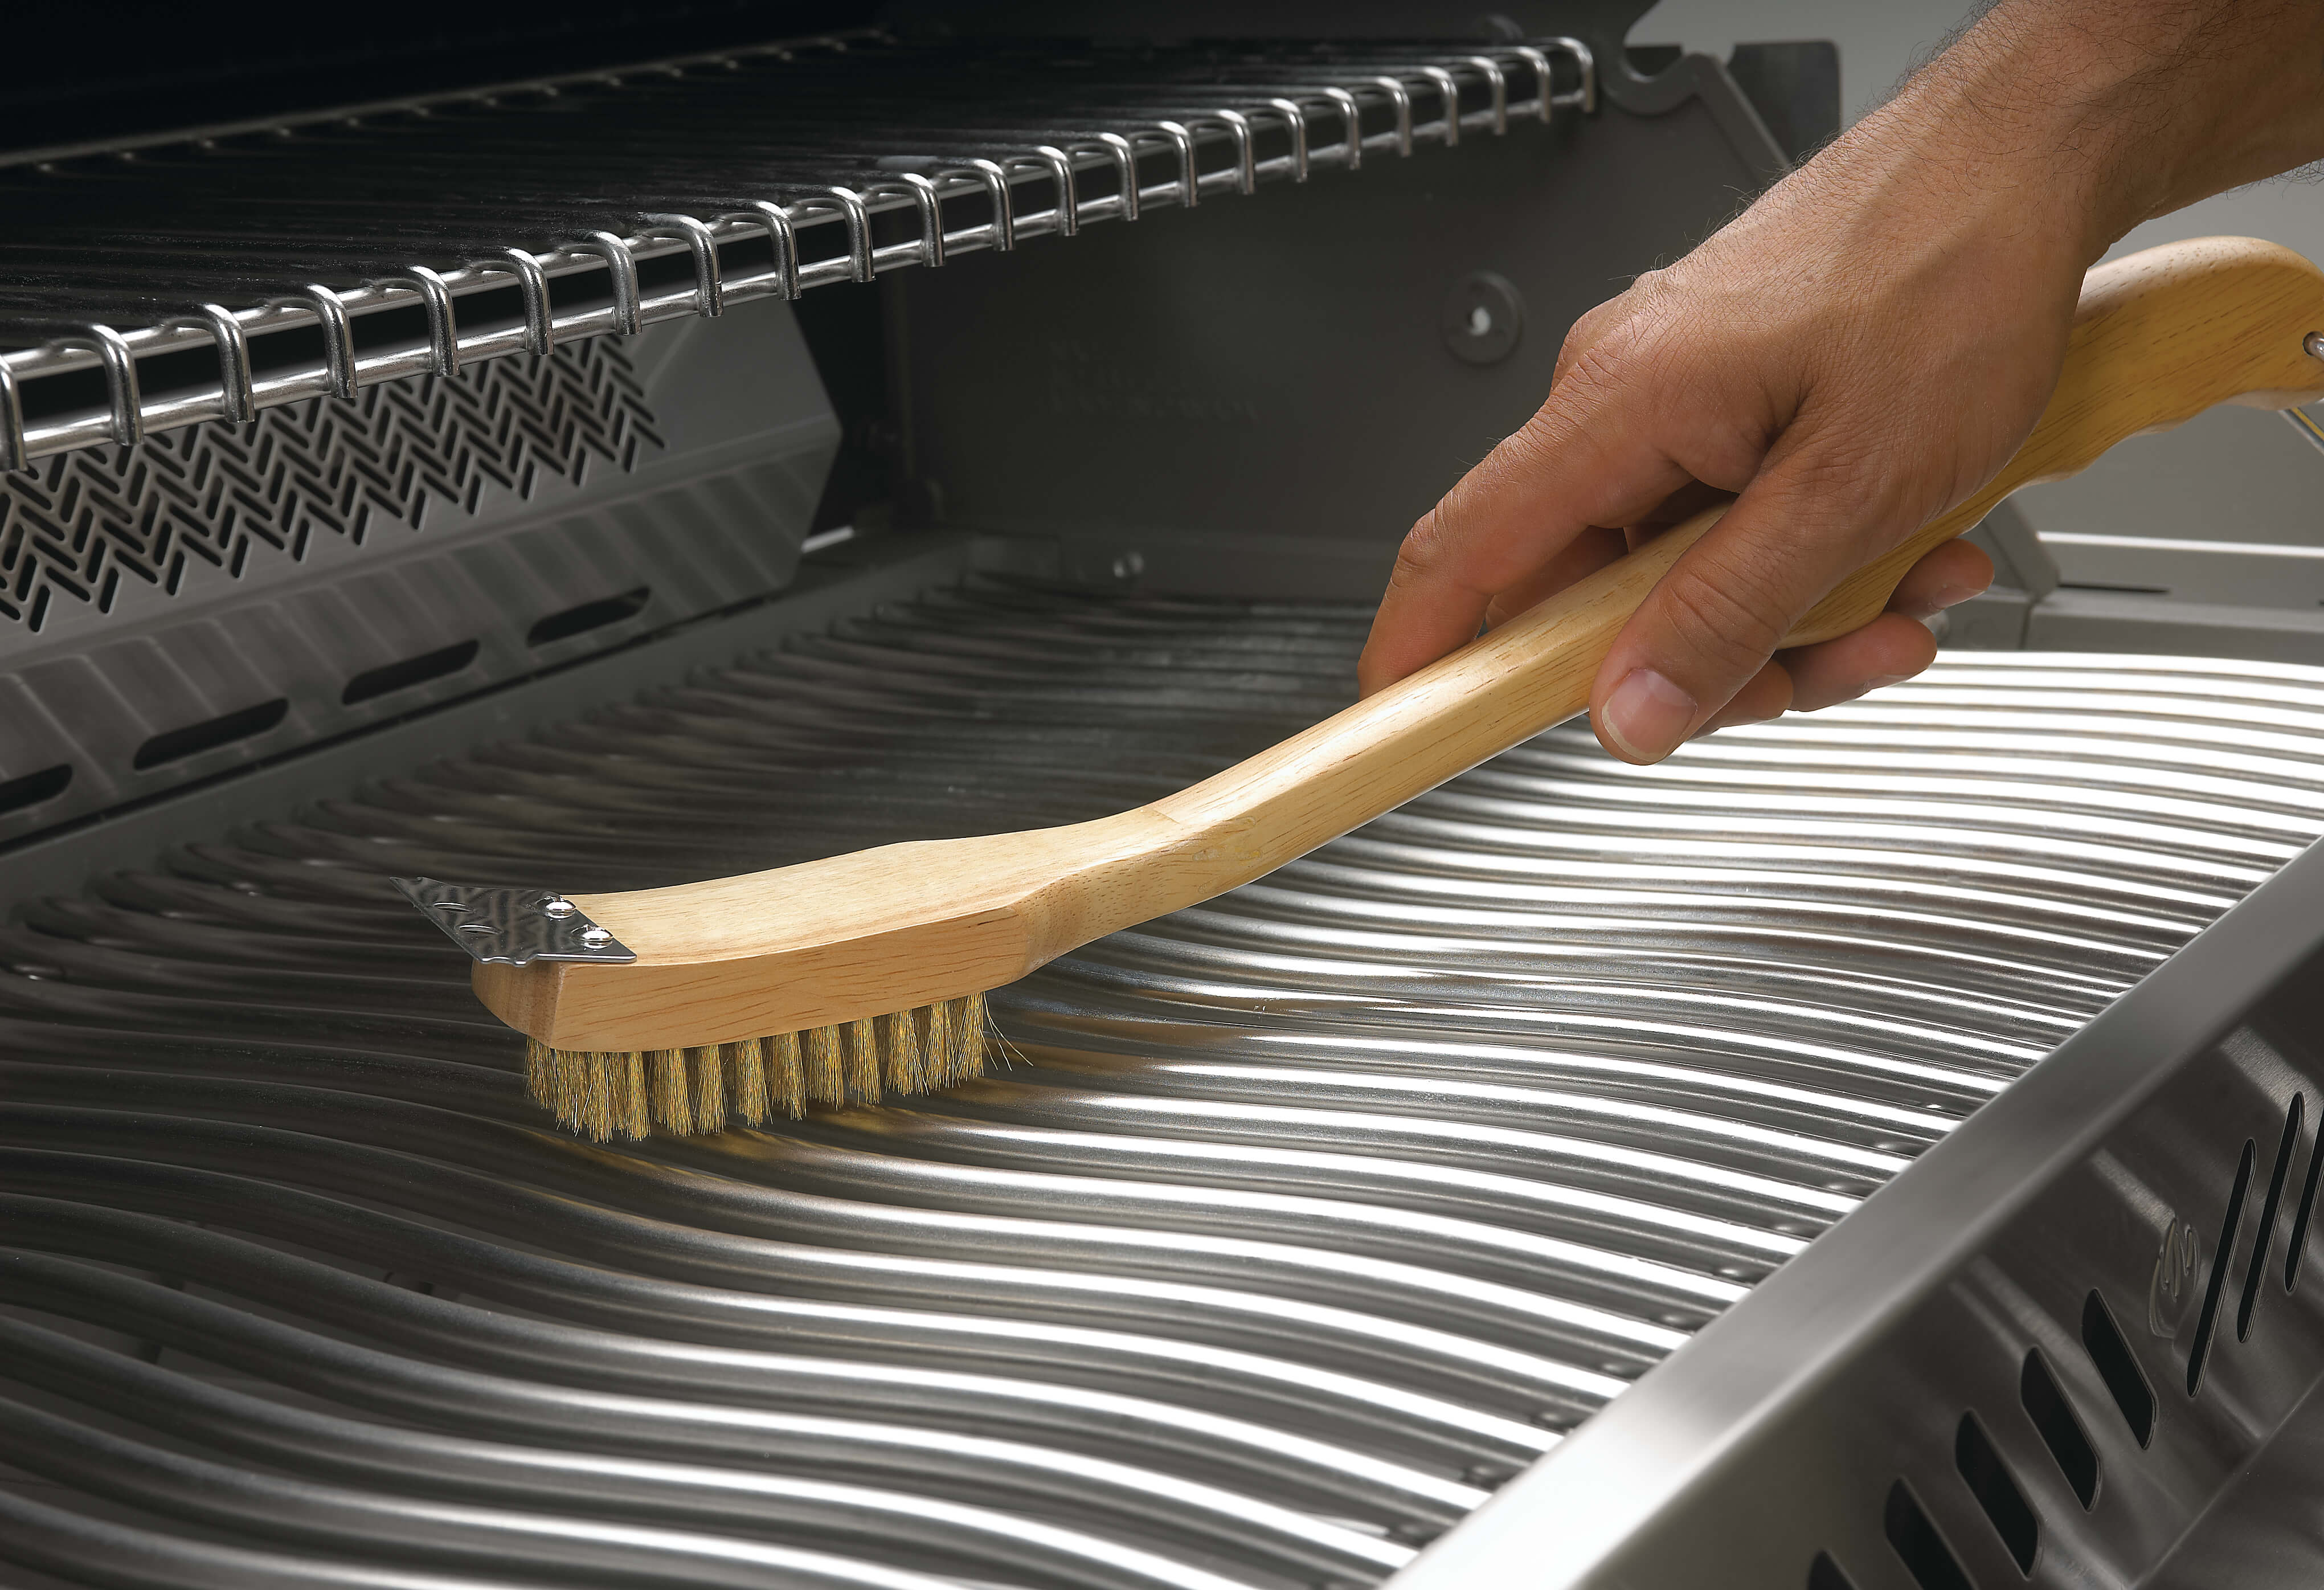 Model: 62028   Napoleon Grill Brush with Brass Bristles